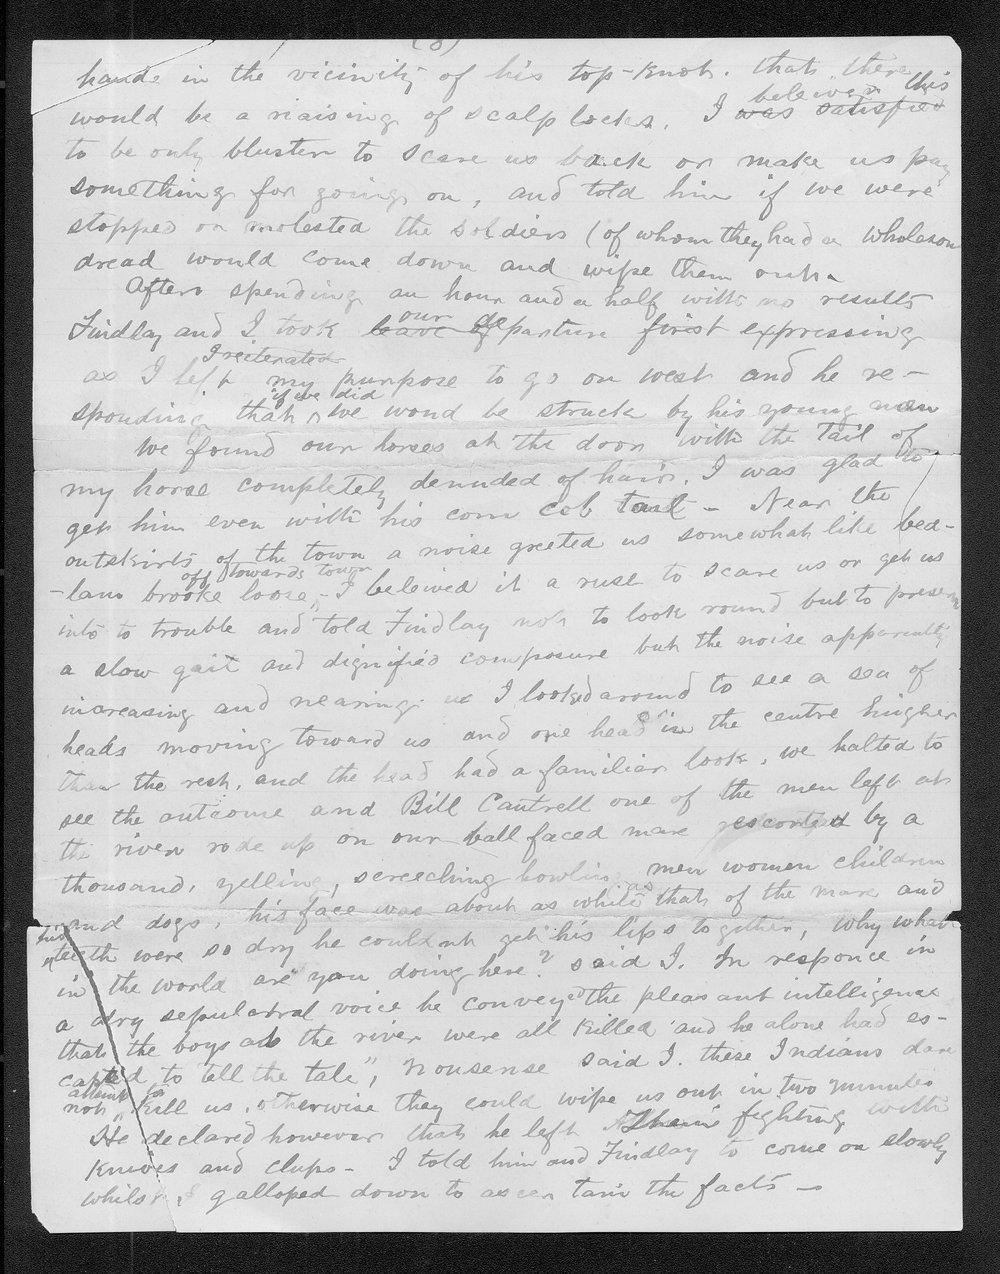 John C. McCoy to Franklin G. Adams - 8